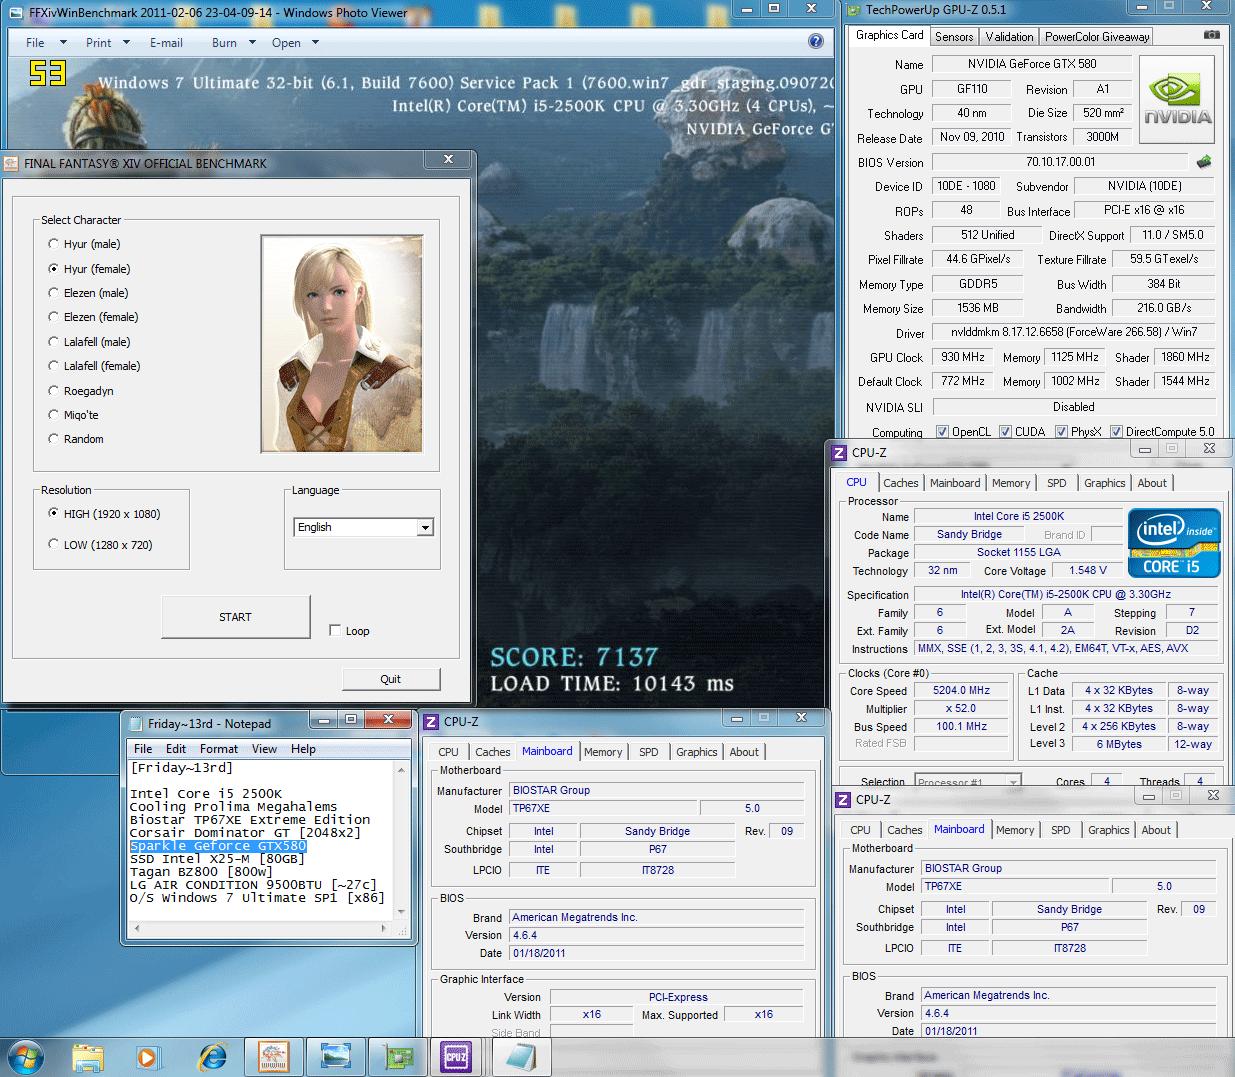 930 1125 1150mv 52 dx9 ffxiv 7137 SPARKLE GeForce GTX580 : Review